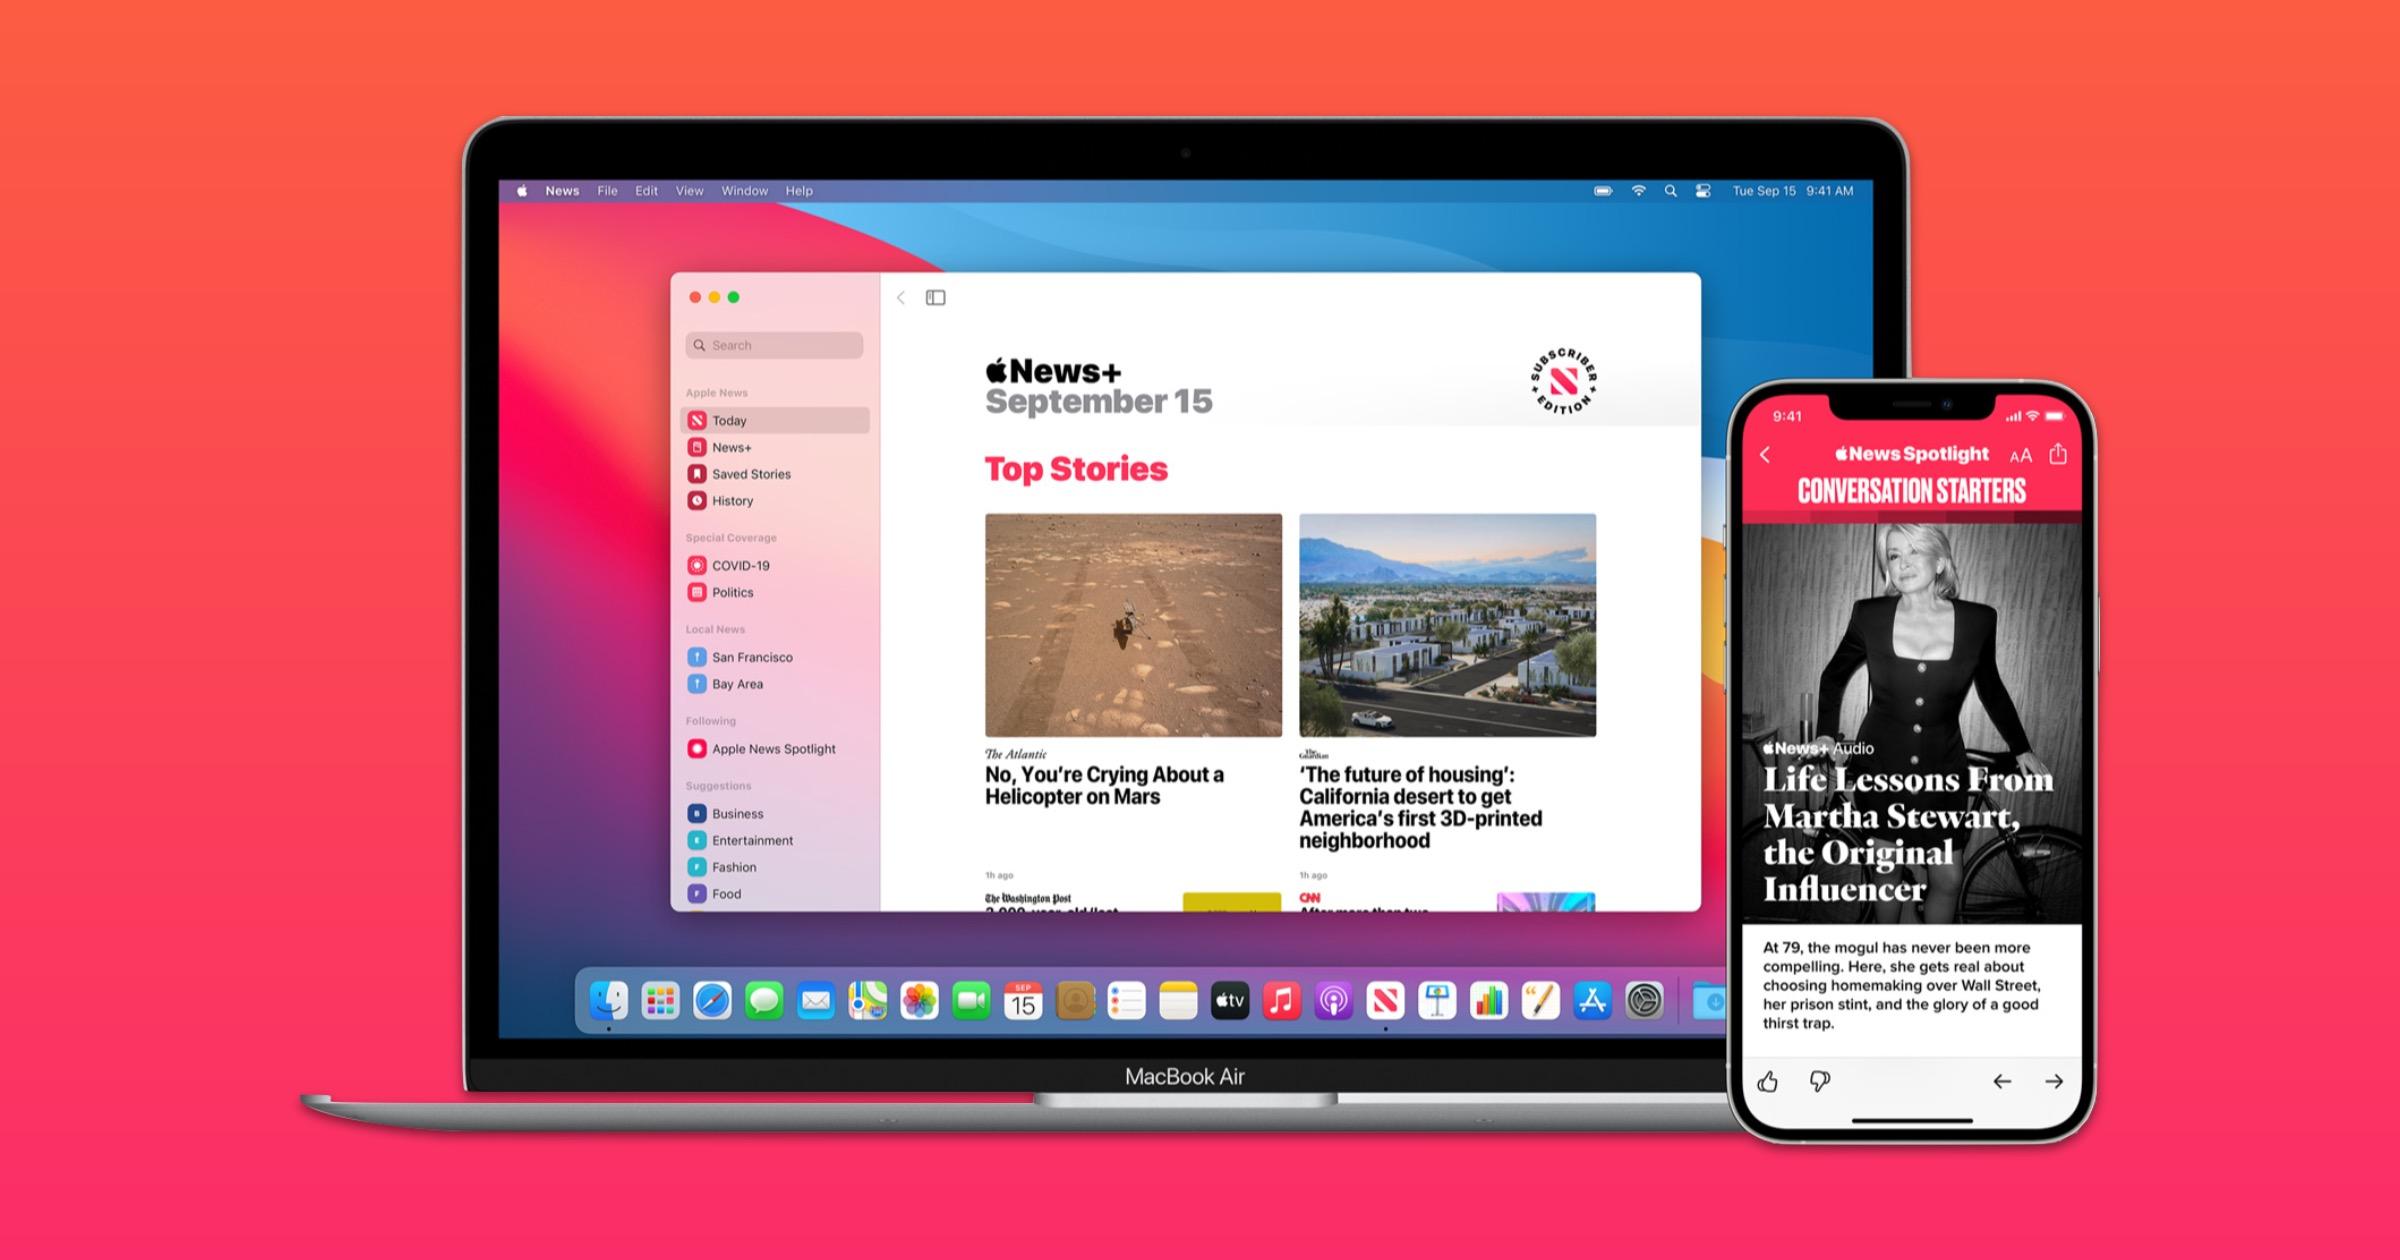 Apple news publisher program